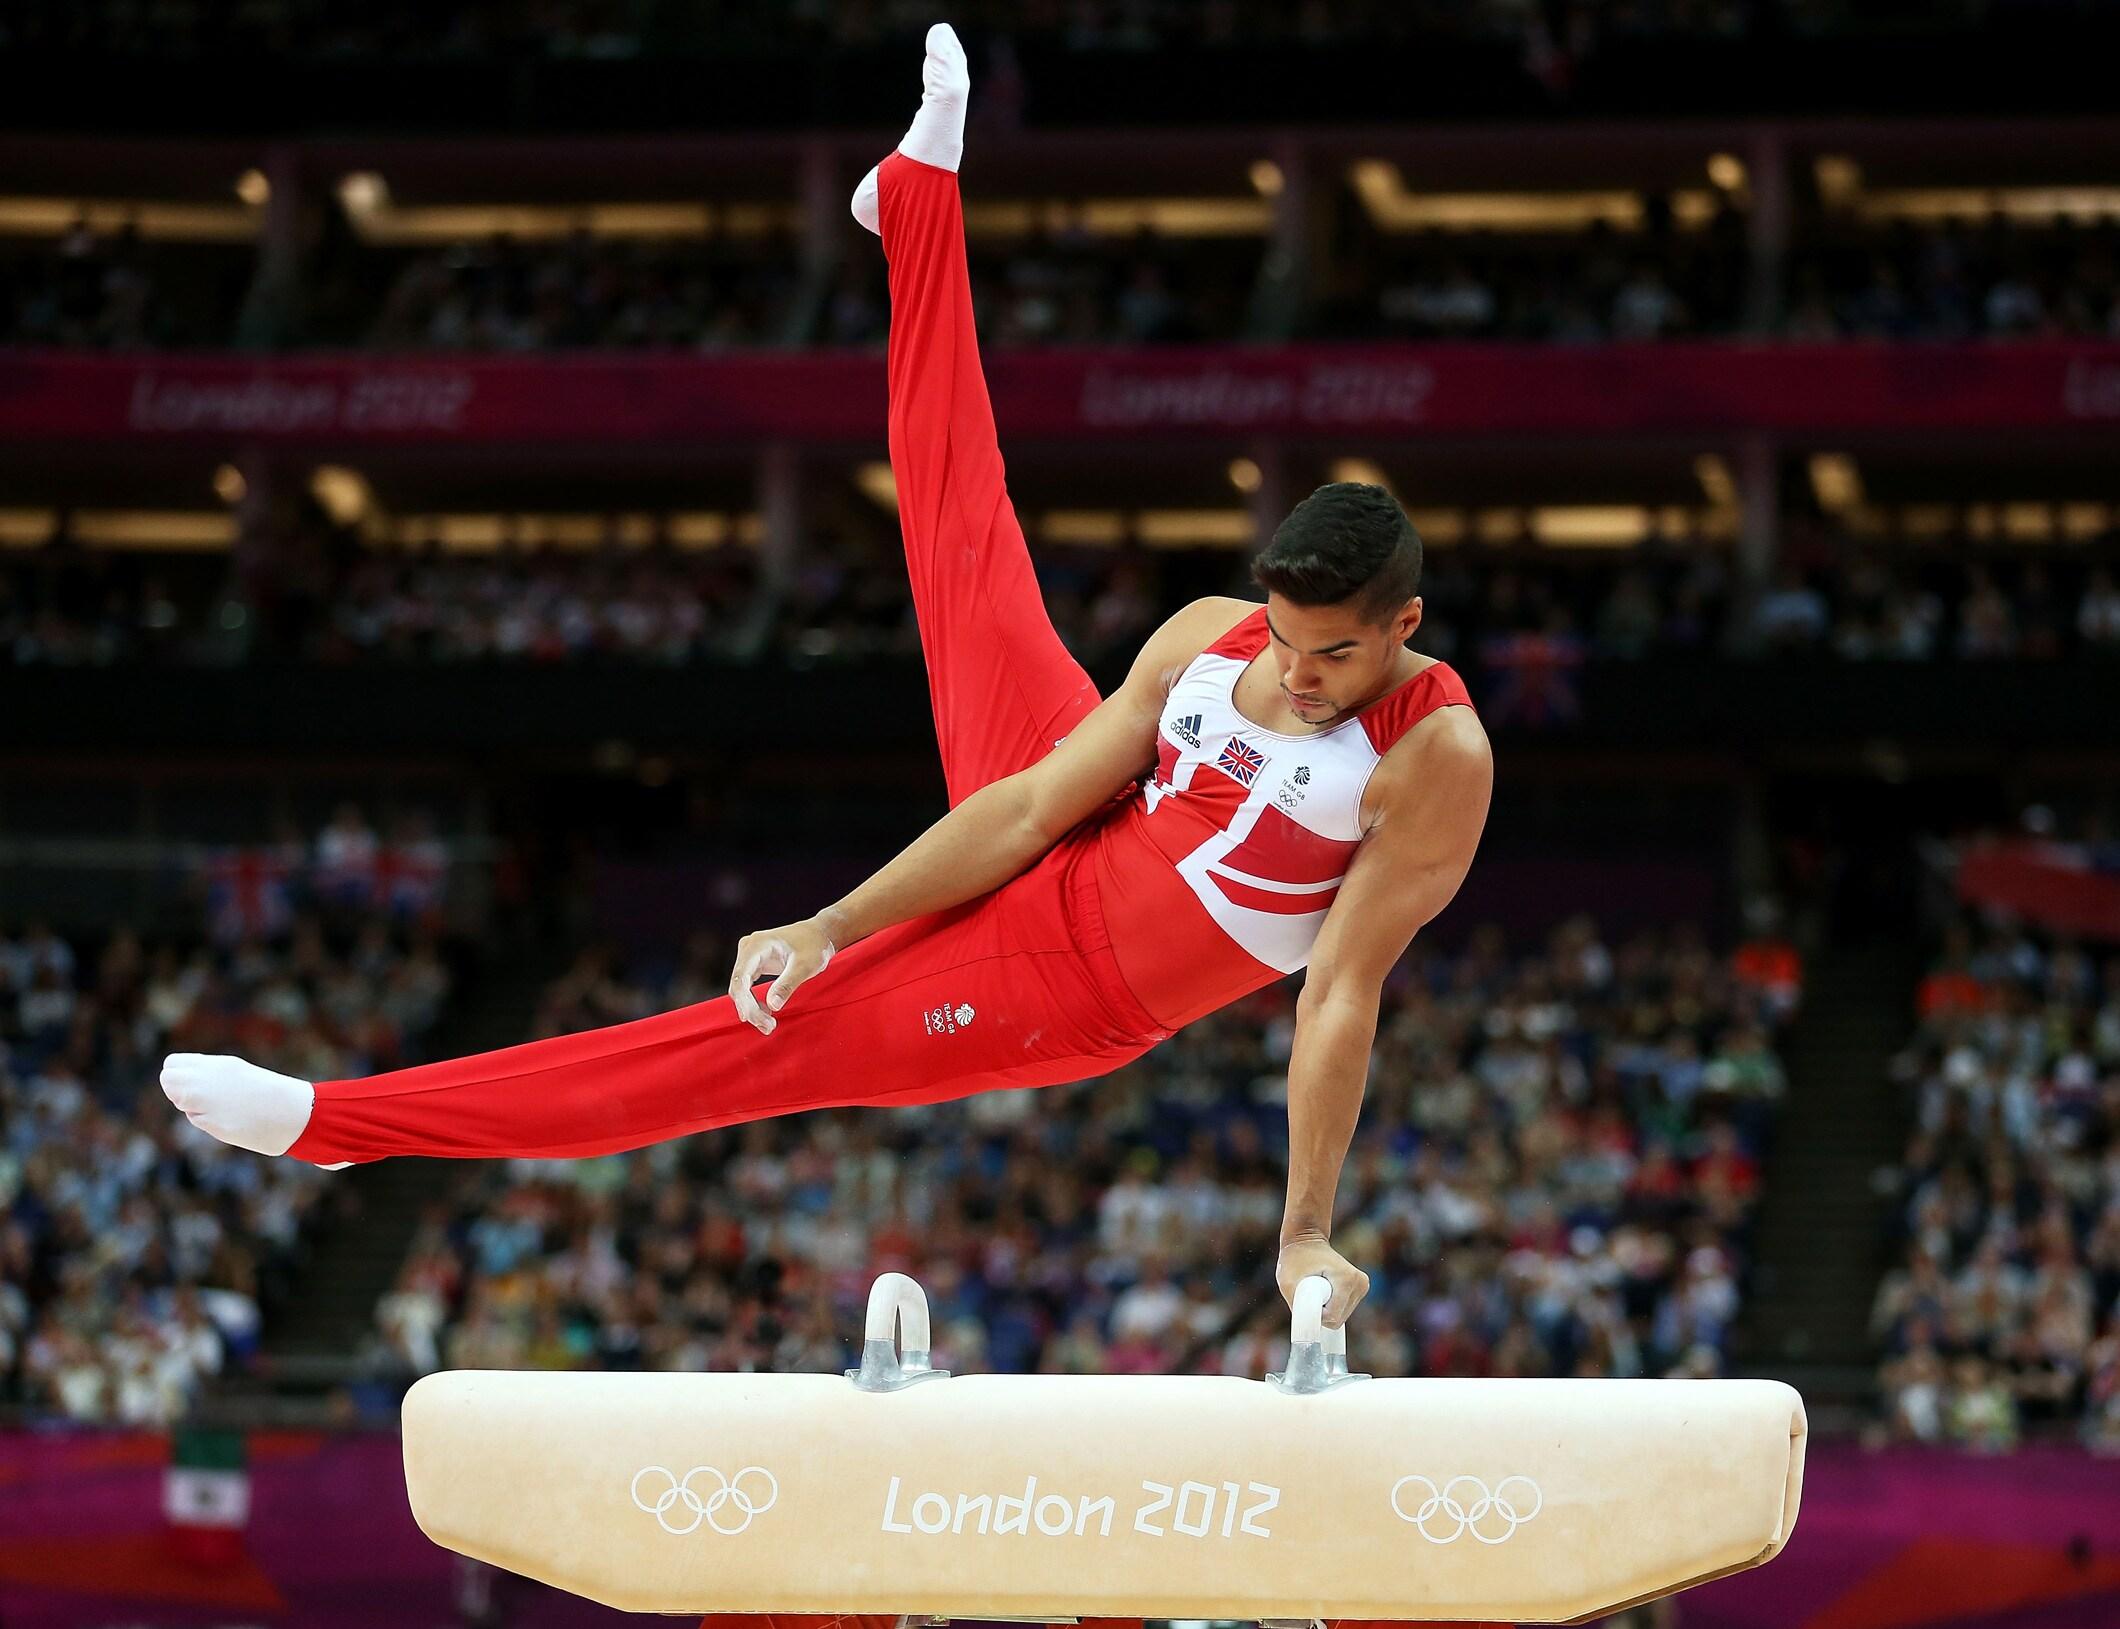 Artistic Gymnastics at London 2012